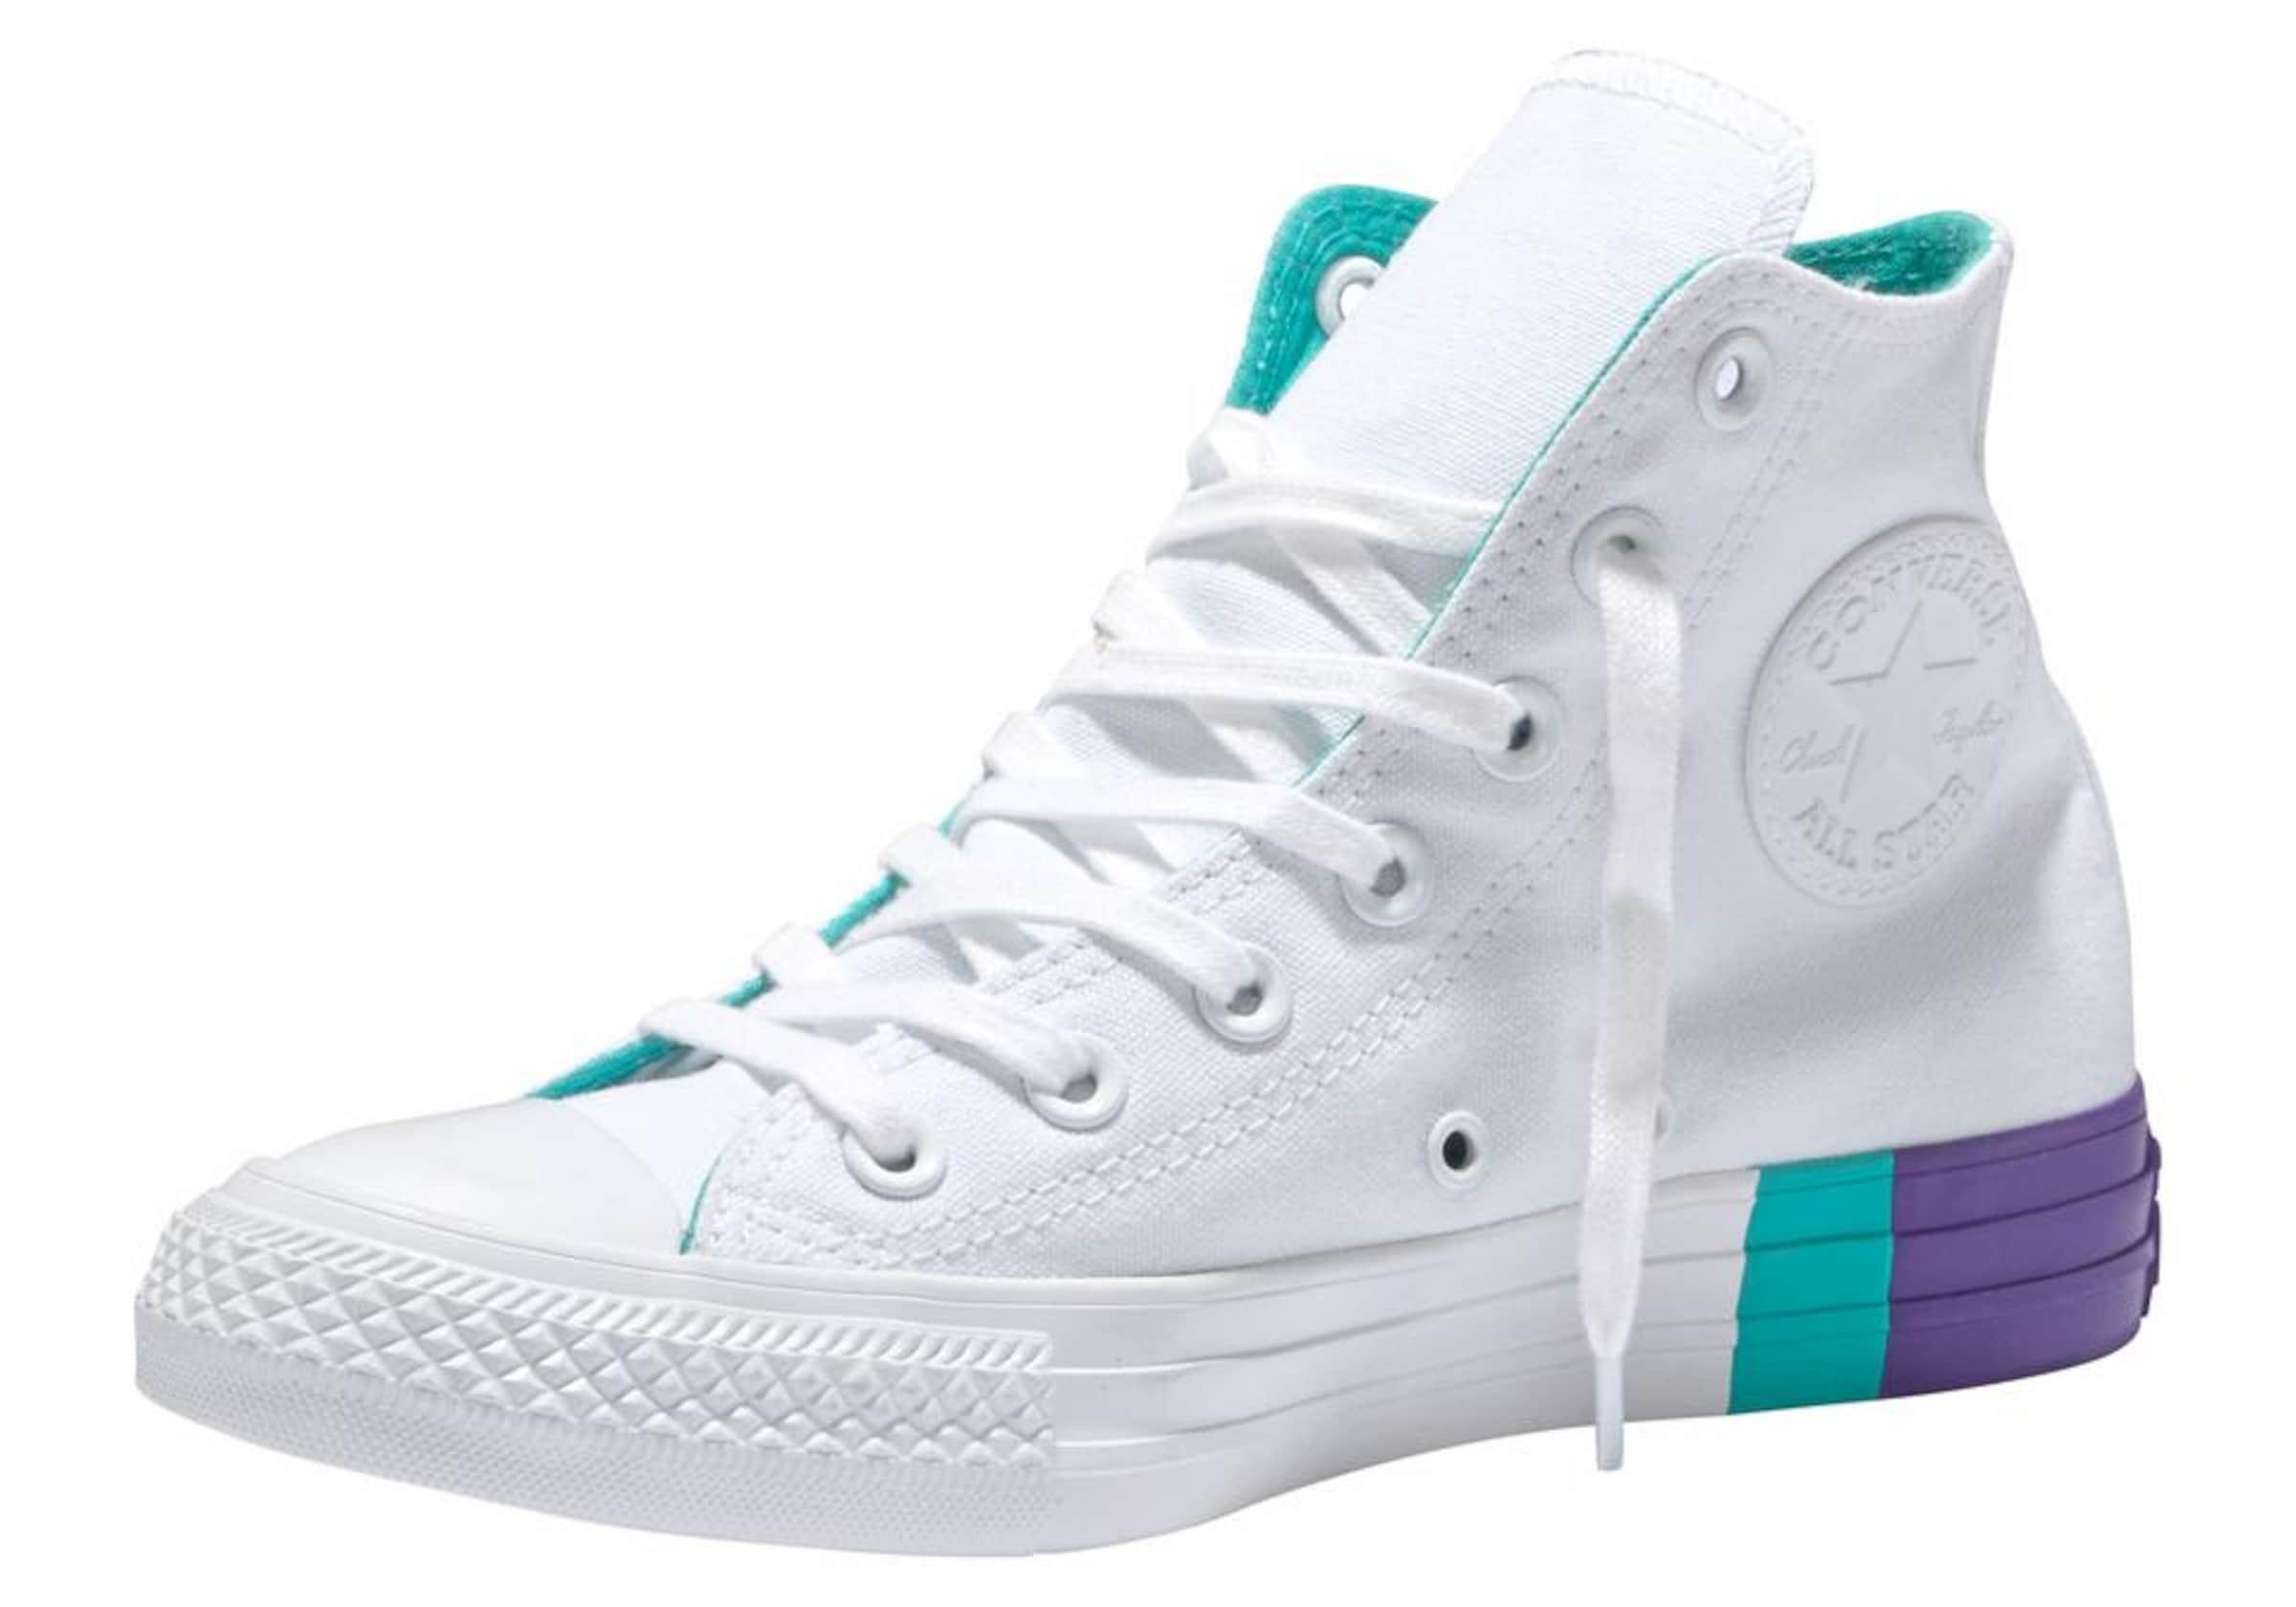 Baskets Converse « All Star Chuck Taylor Salut » Lilas Foncé / Blanc gDVHVvQ7